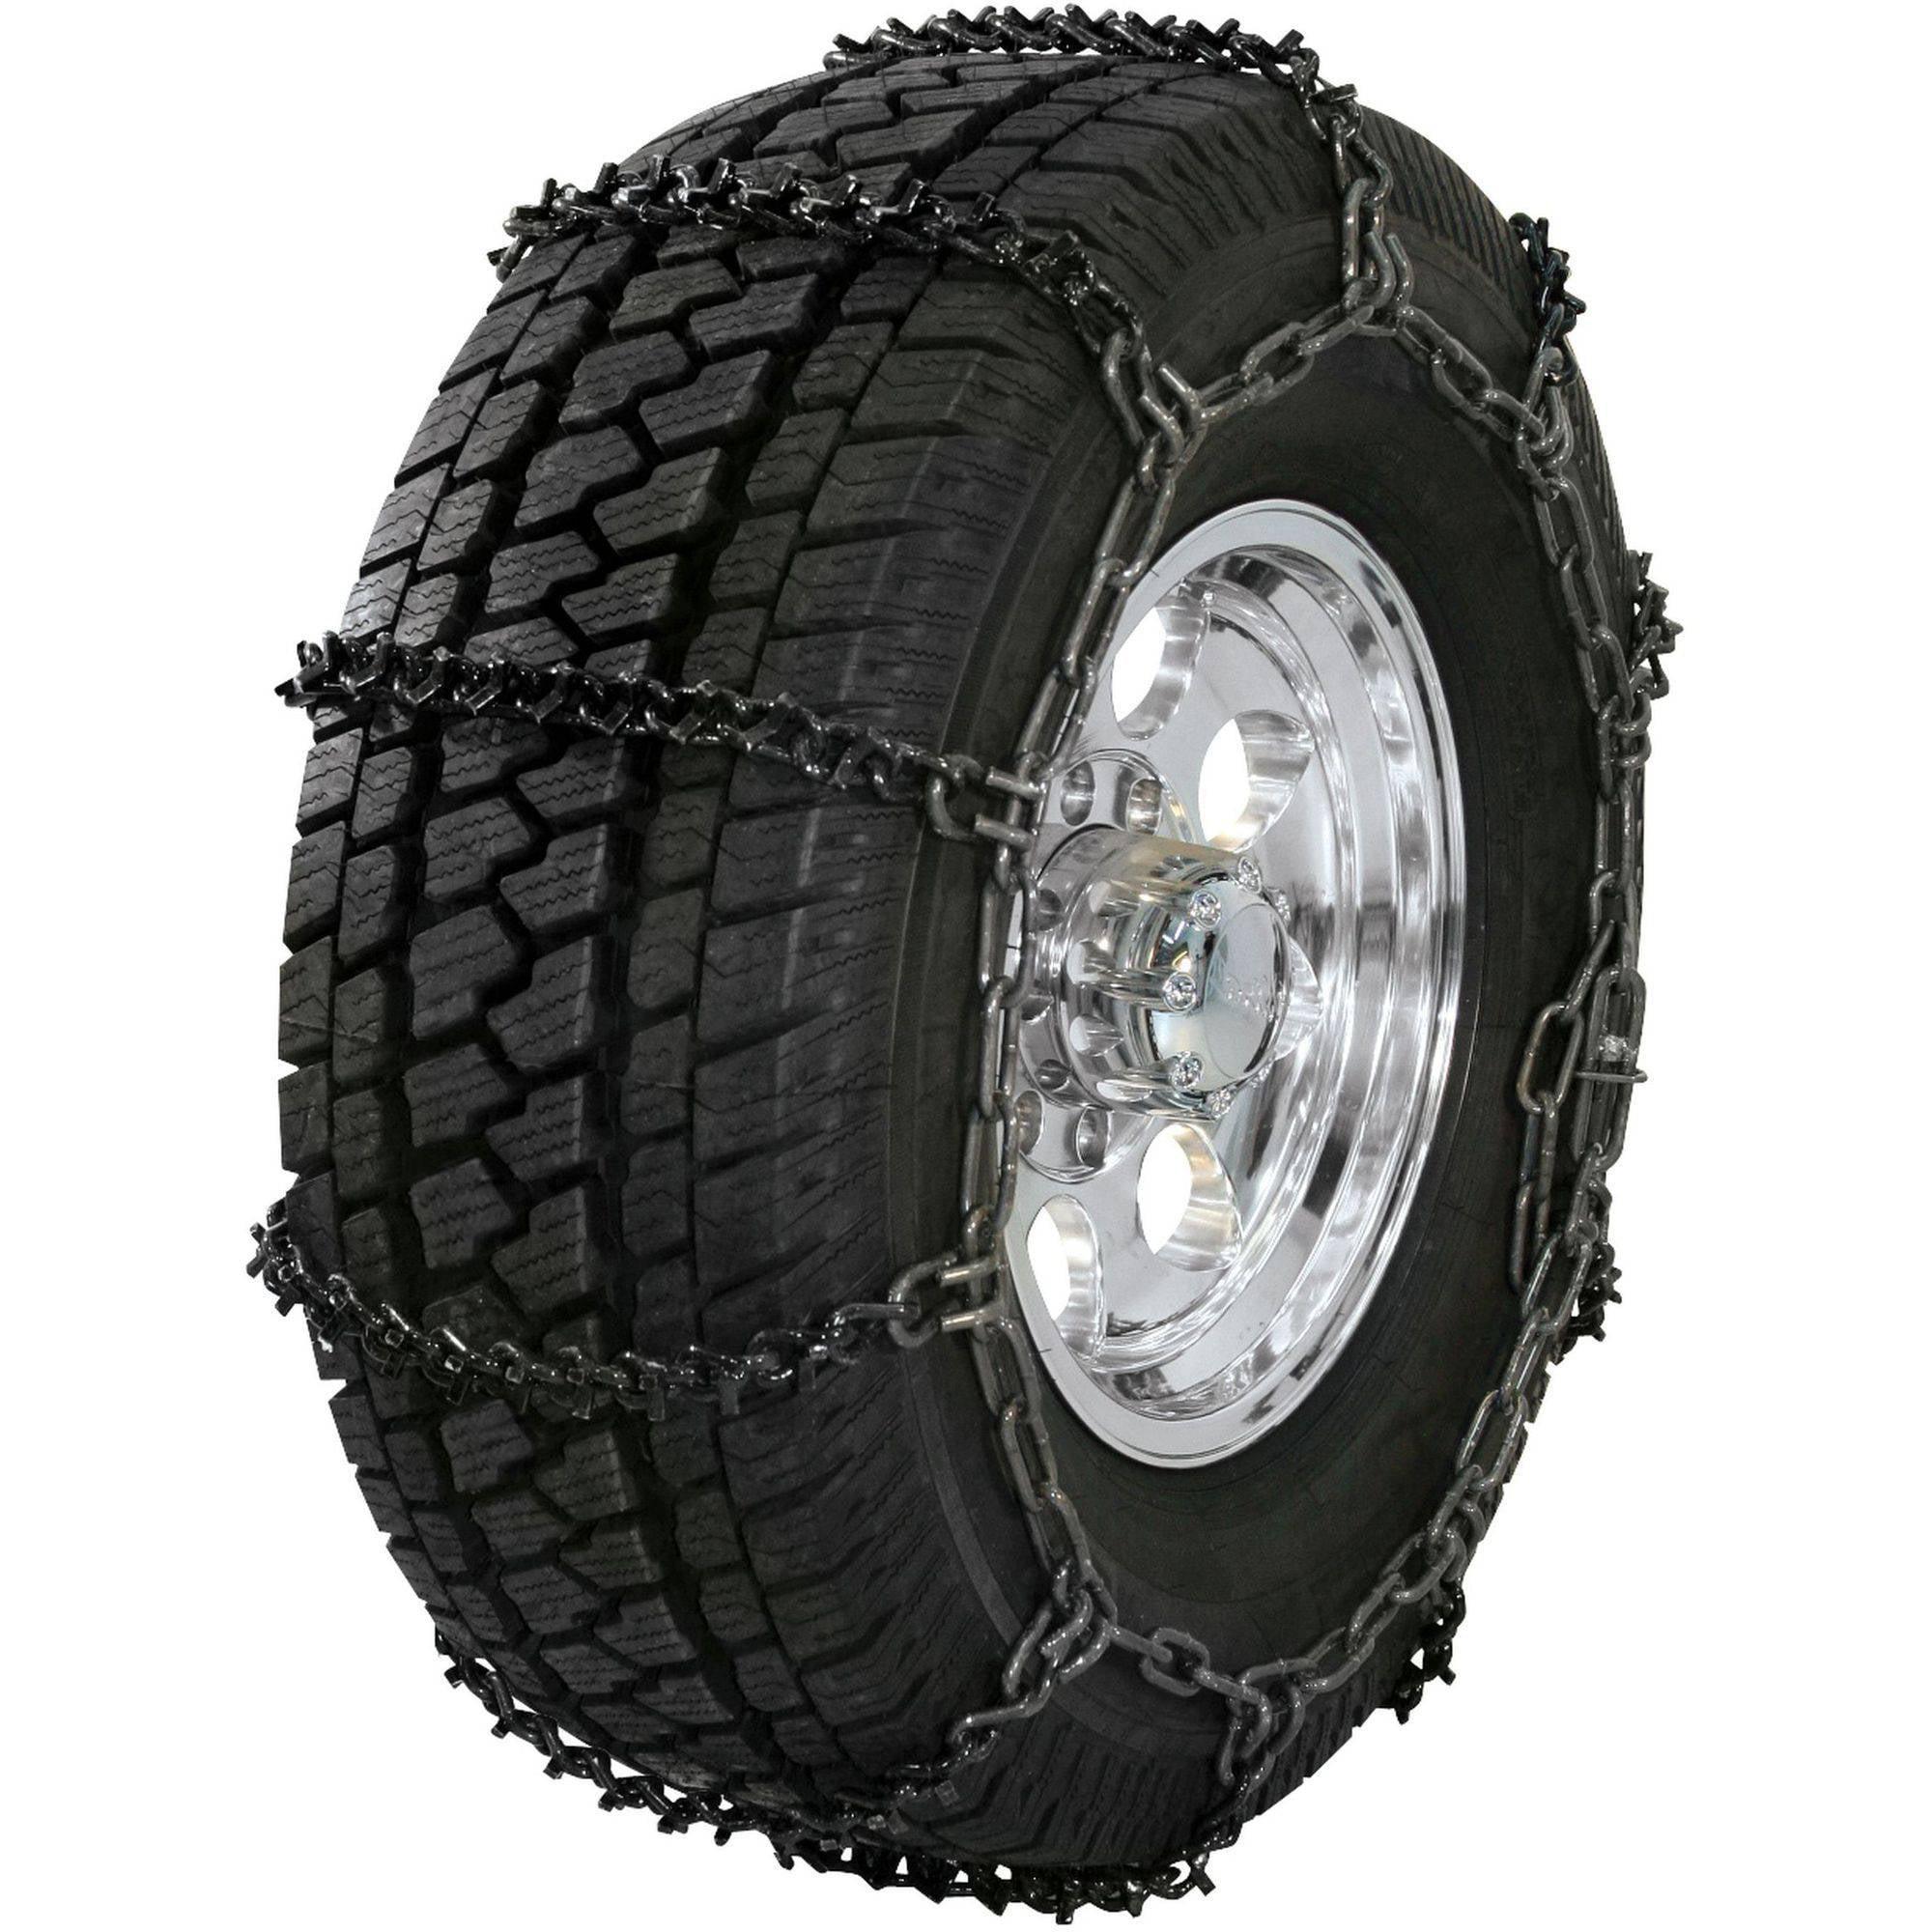 Peerless Chain Wide Base V-Bar Tire Chains, #QG3810 by Peerless Chain Company